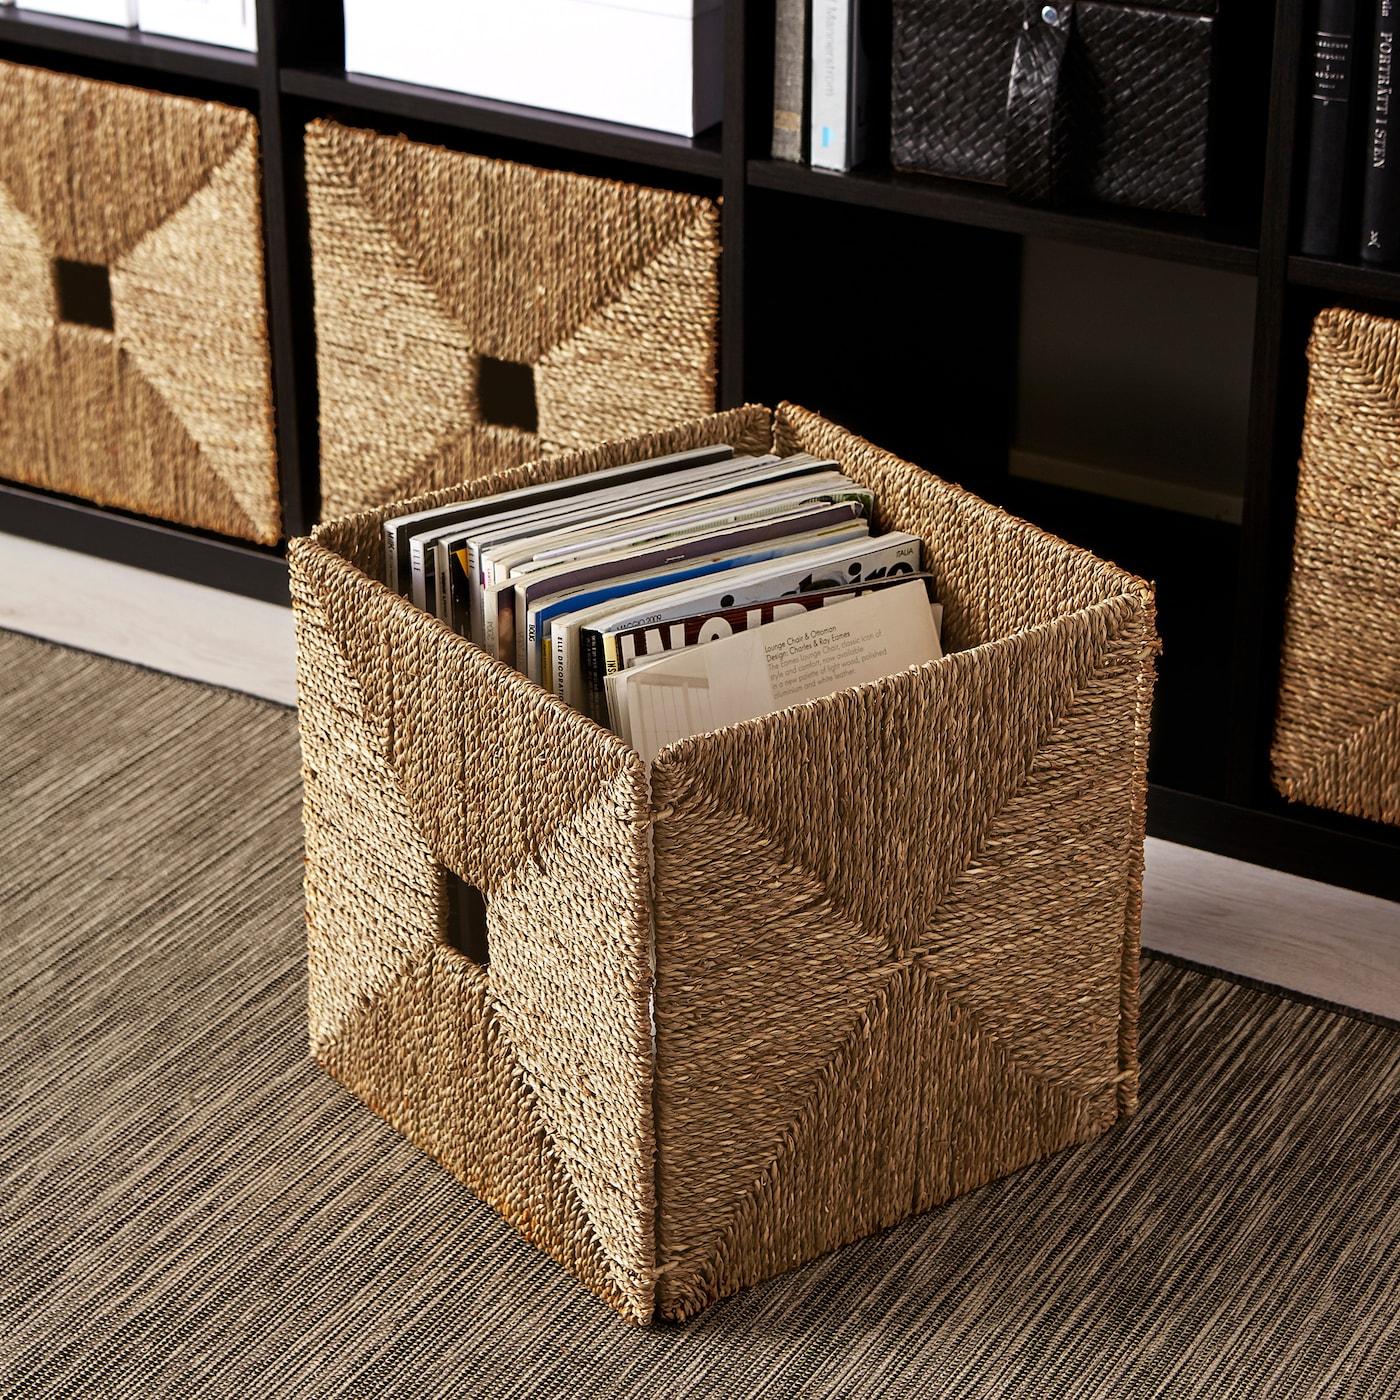 Ikea KNIPSA Basket, seagrass